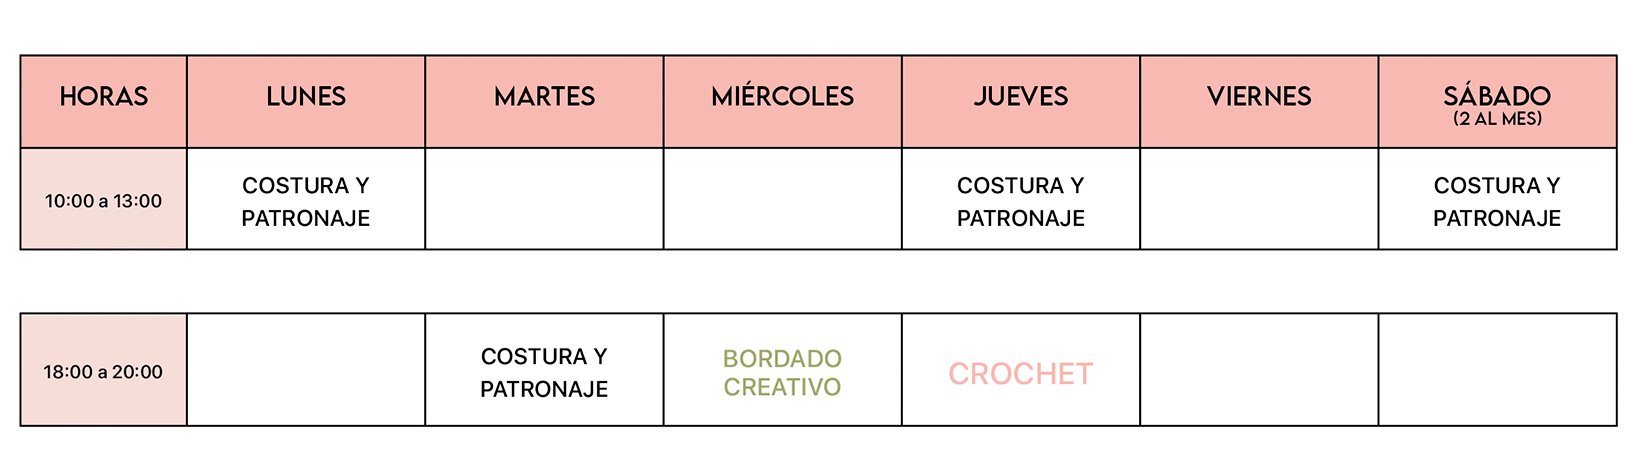 horario clases de costura